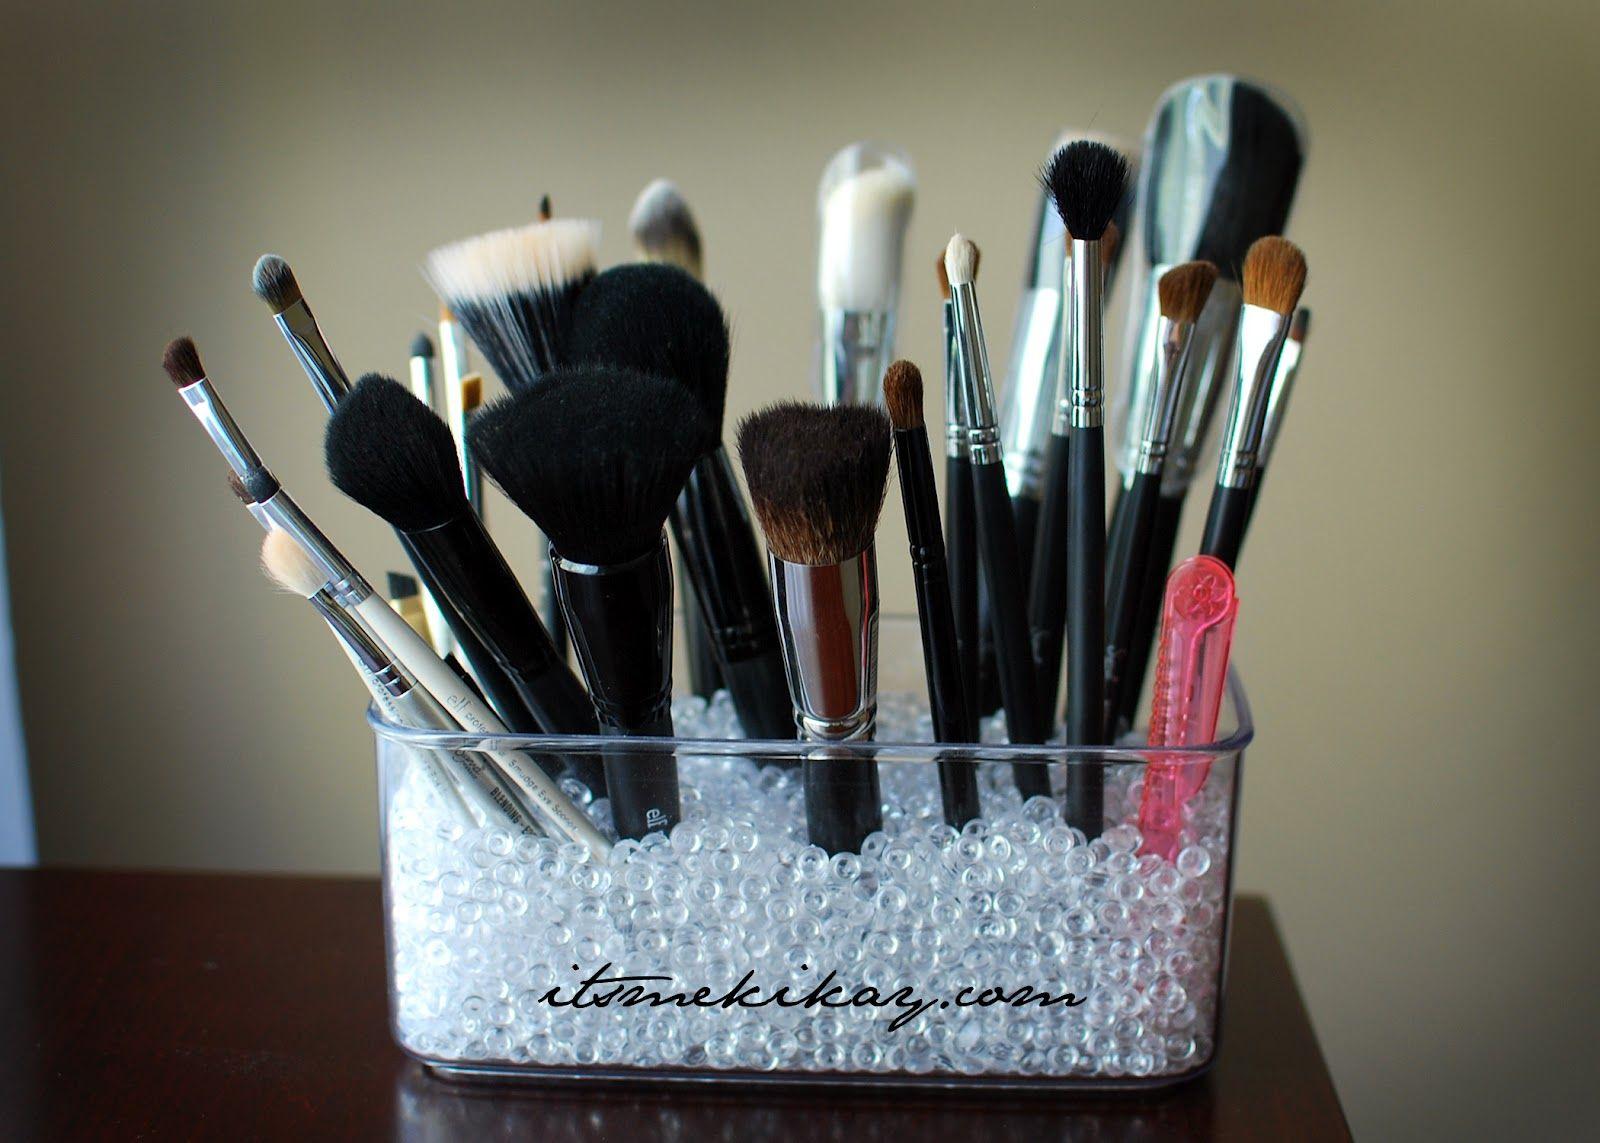 It's Me Kik y! My Favorite Makeup Brushes DIY sephora